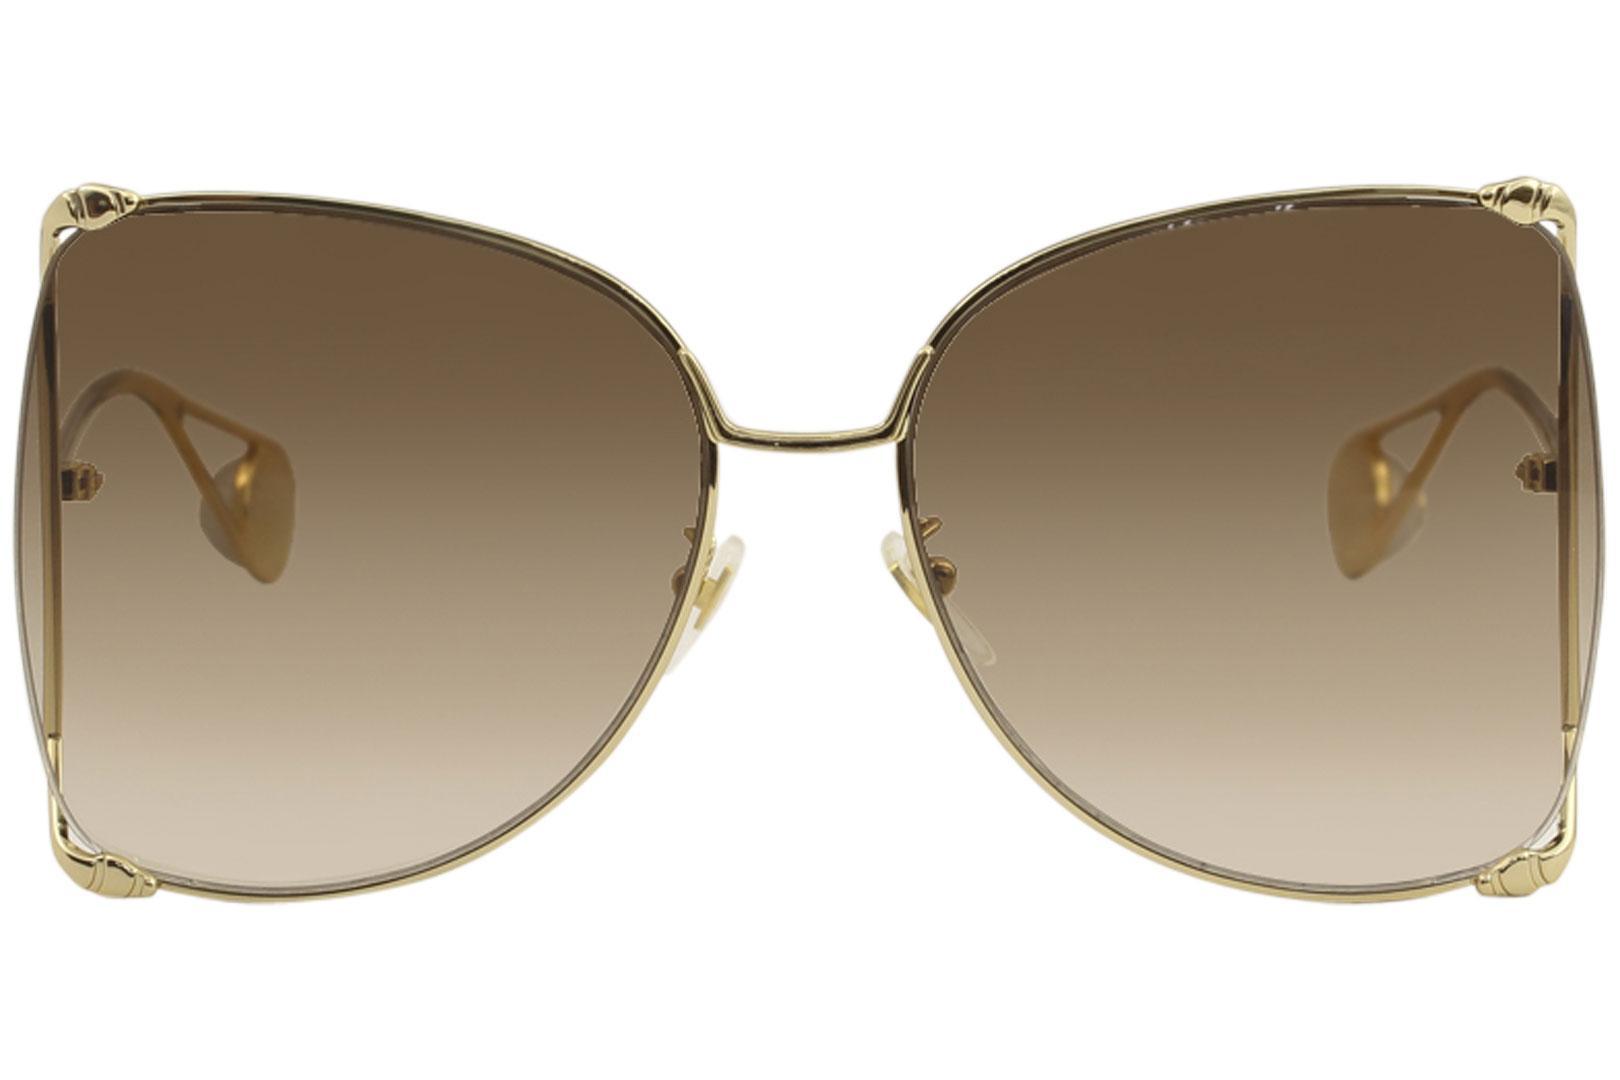 579c73a6b94 Gucci Women s Sensual Romantic GG0252S GG 0252 S Fashion Butterfly  Sunglasses